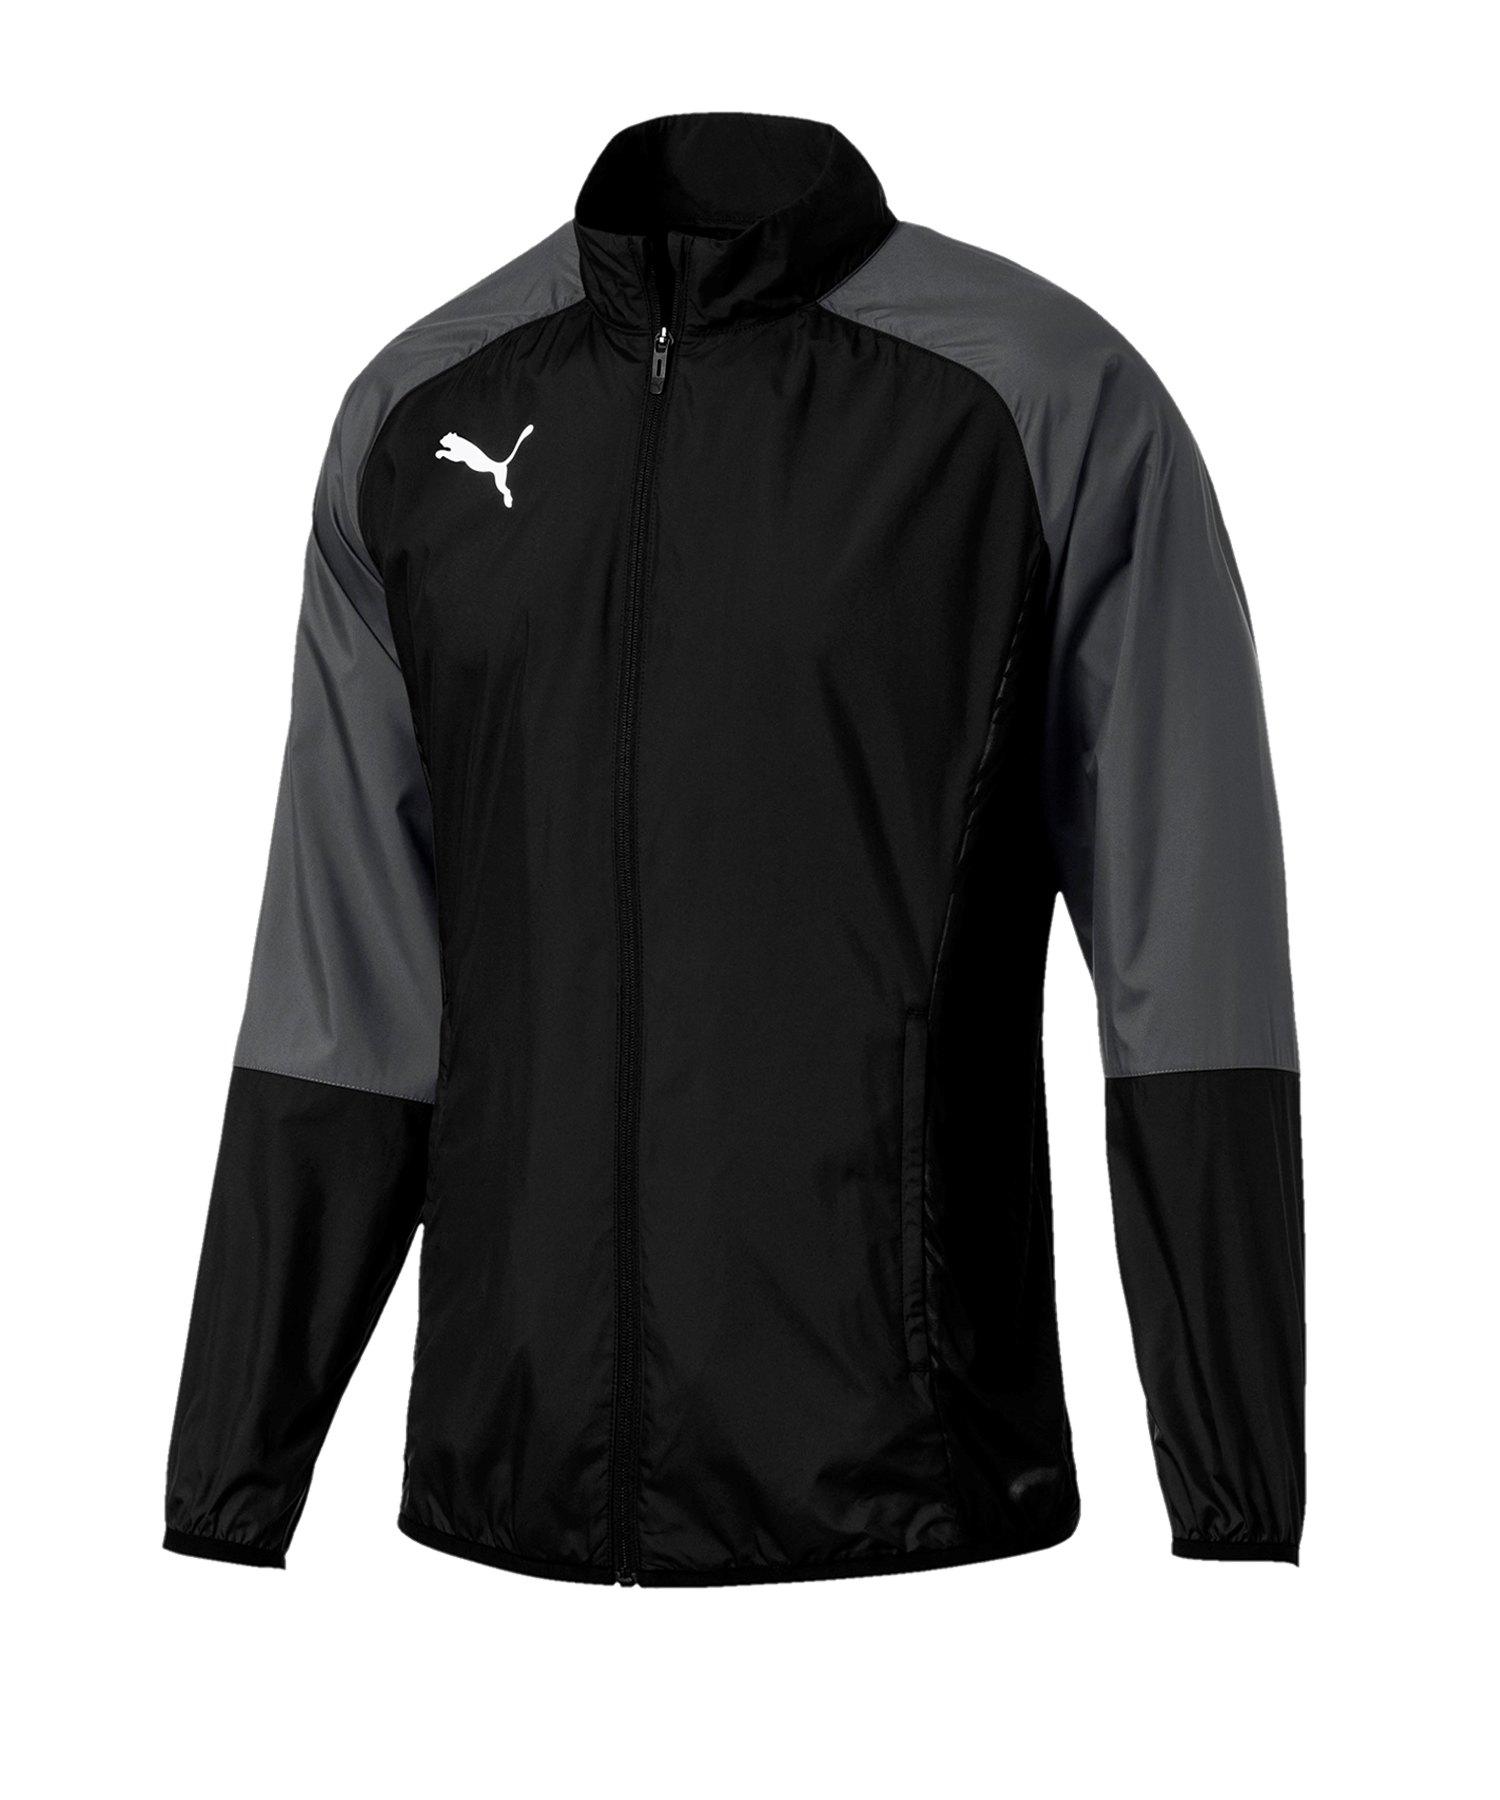 PUMA CUP Sideline Core Woven Jacket Schwarz F03 - schwarz